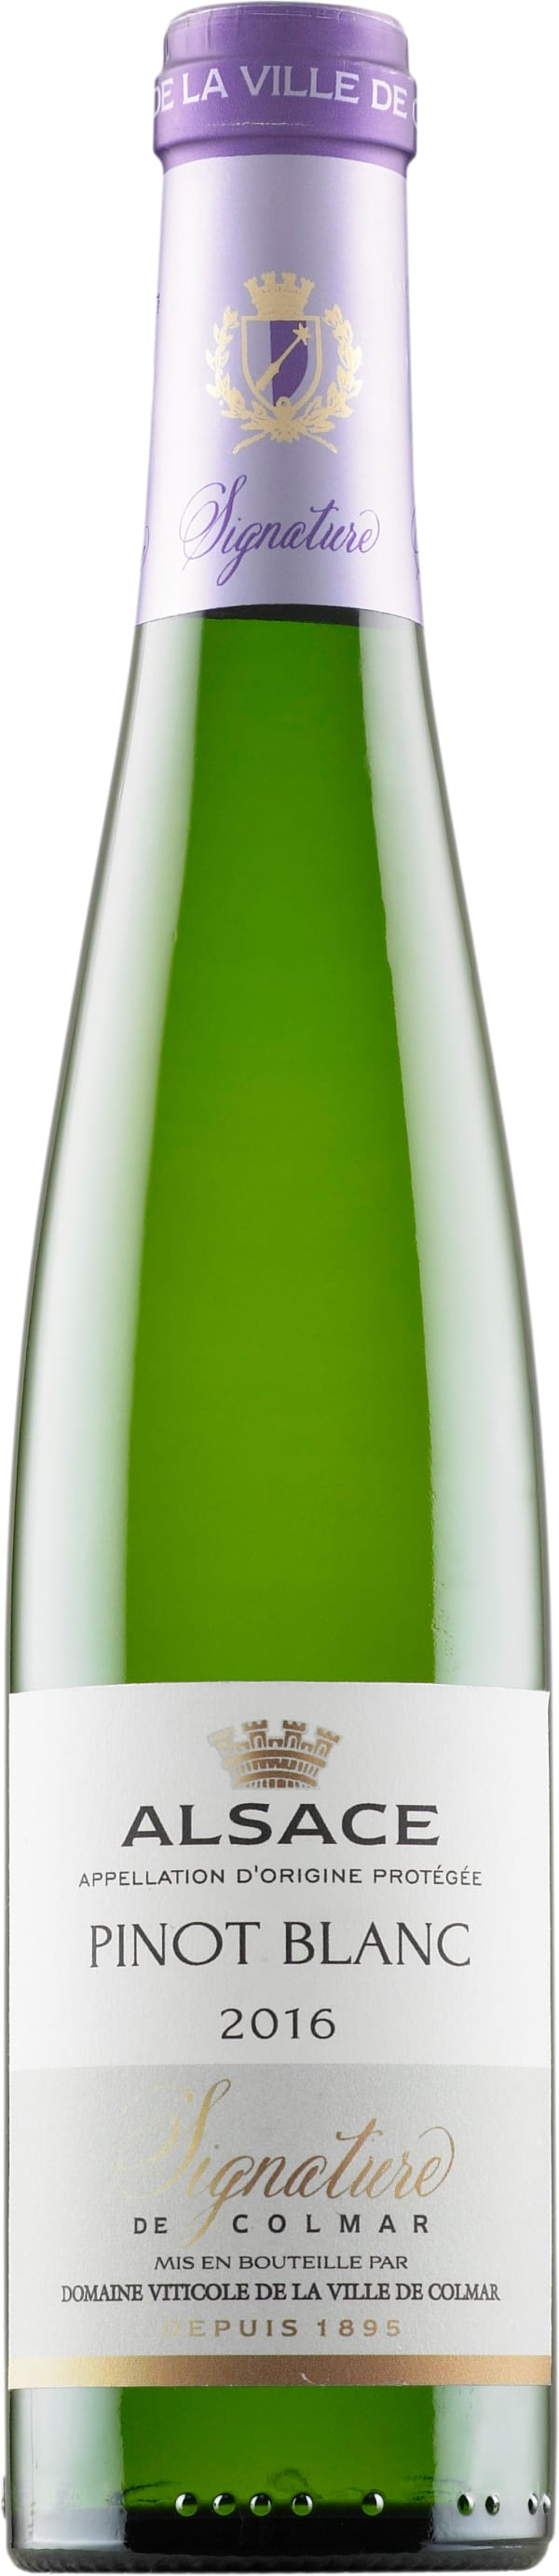 Signature de Colmar Pinot Blanc 2020